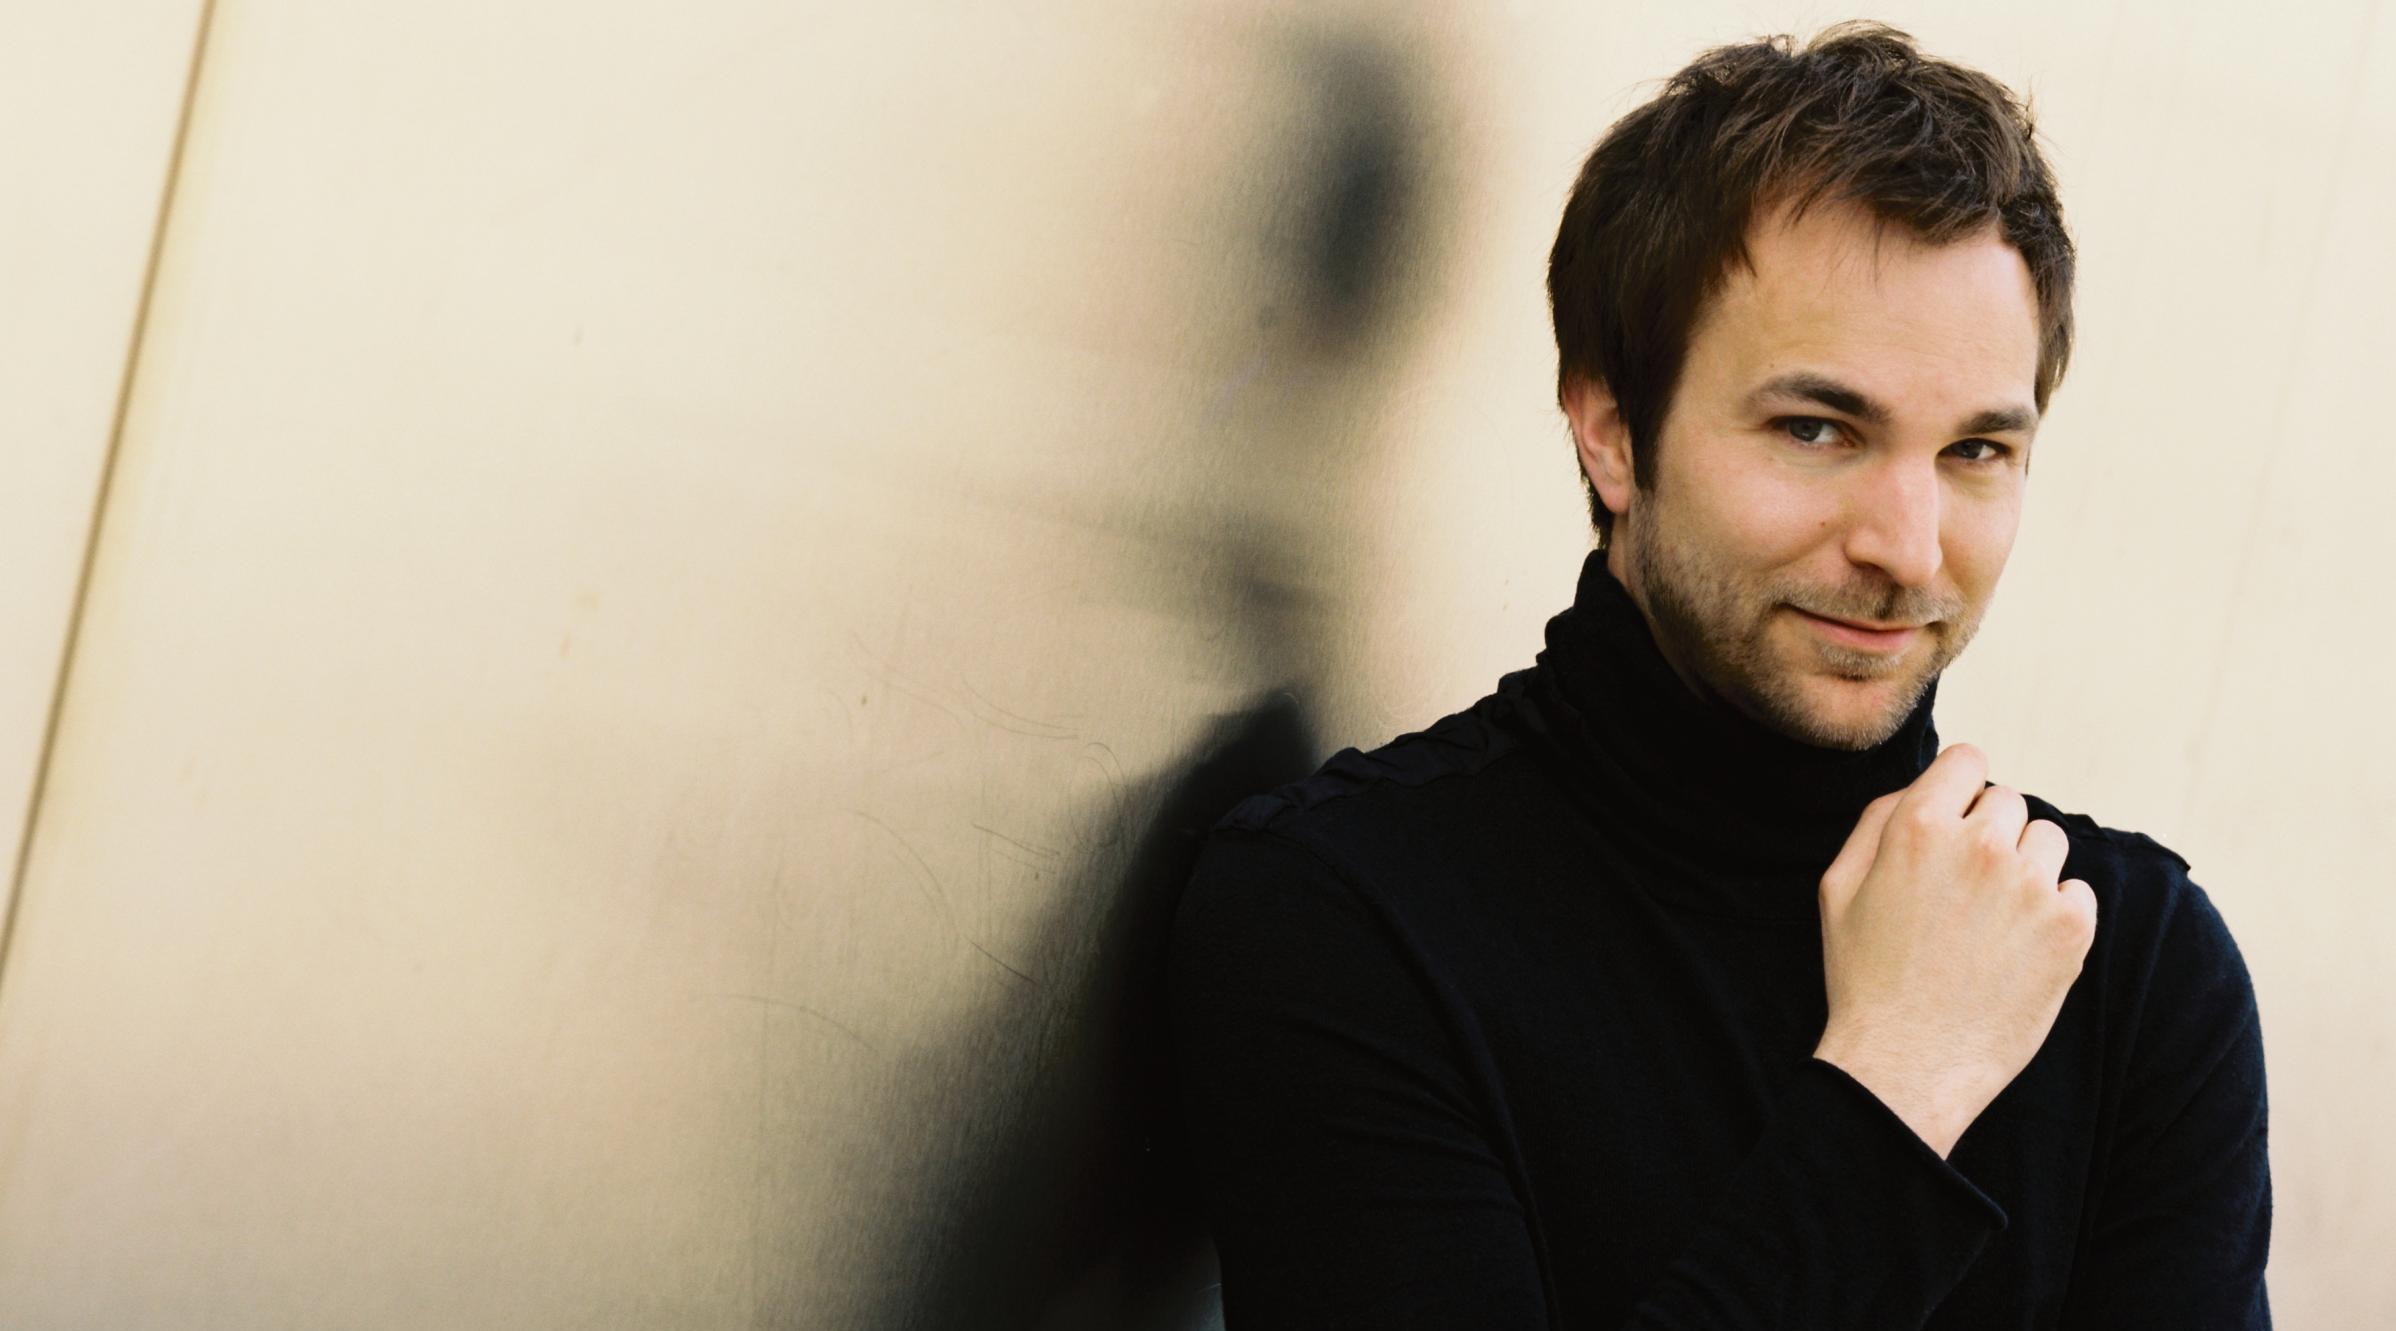 alexander shelley herbert schuch piano orchestre national de belgique. Black Bedroom Furniture Sets. Home Design Ideas